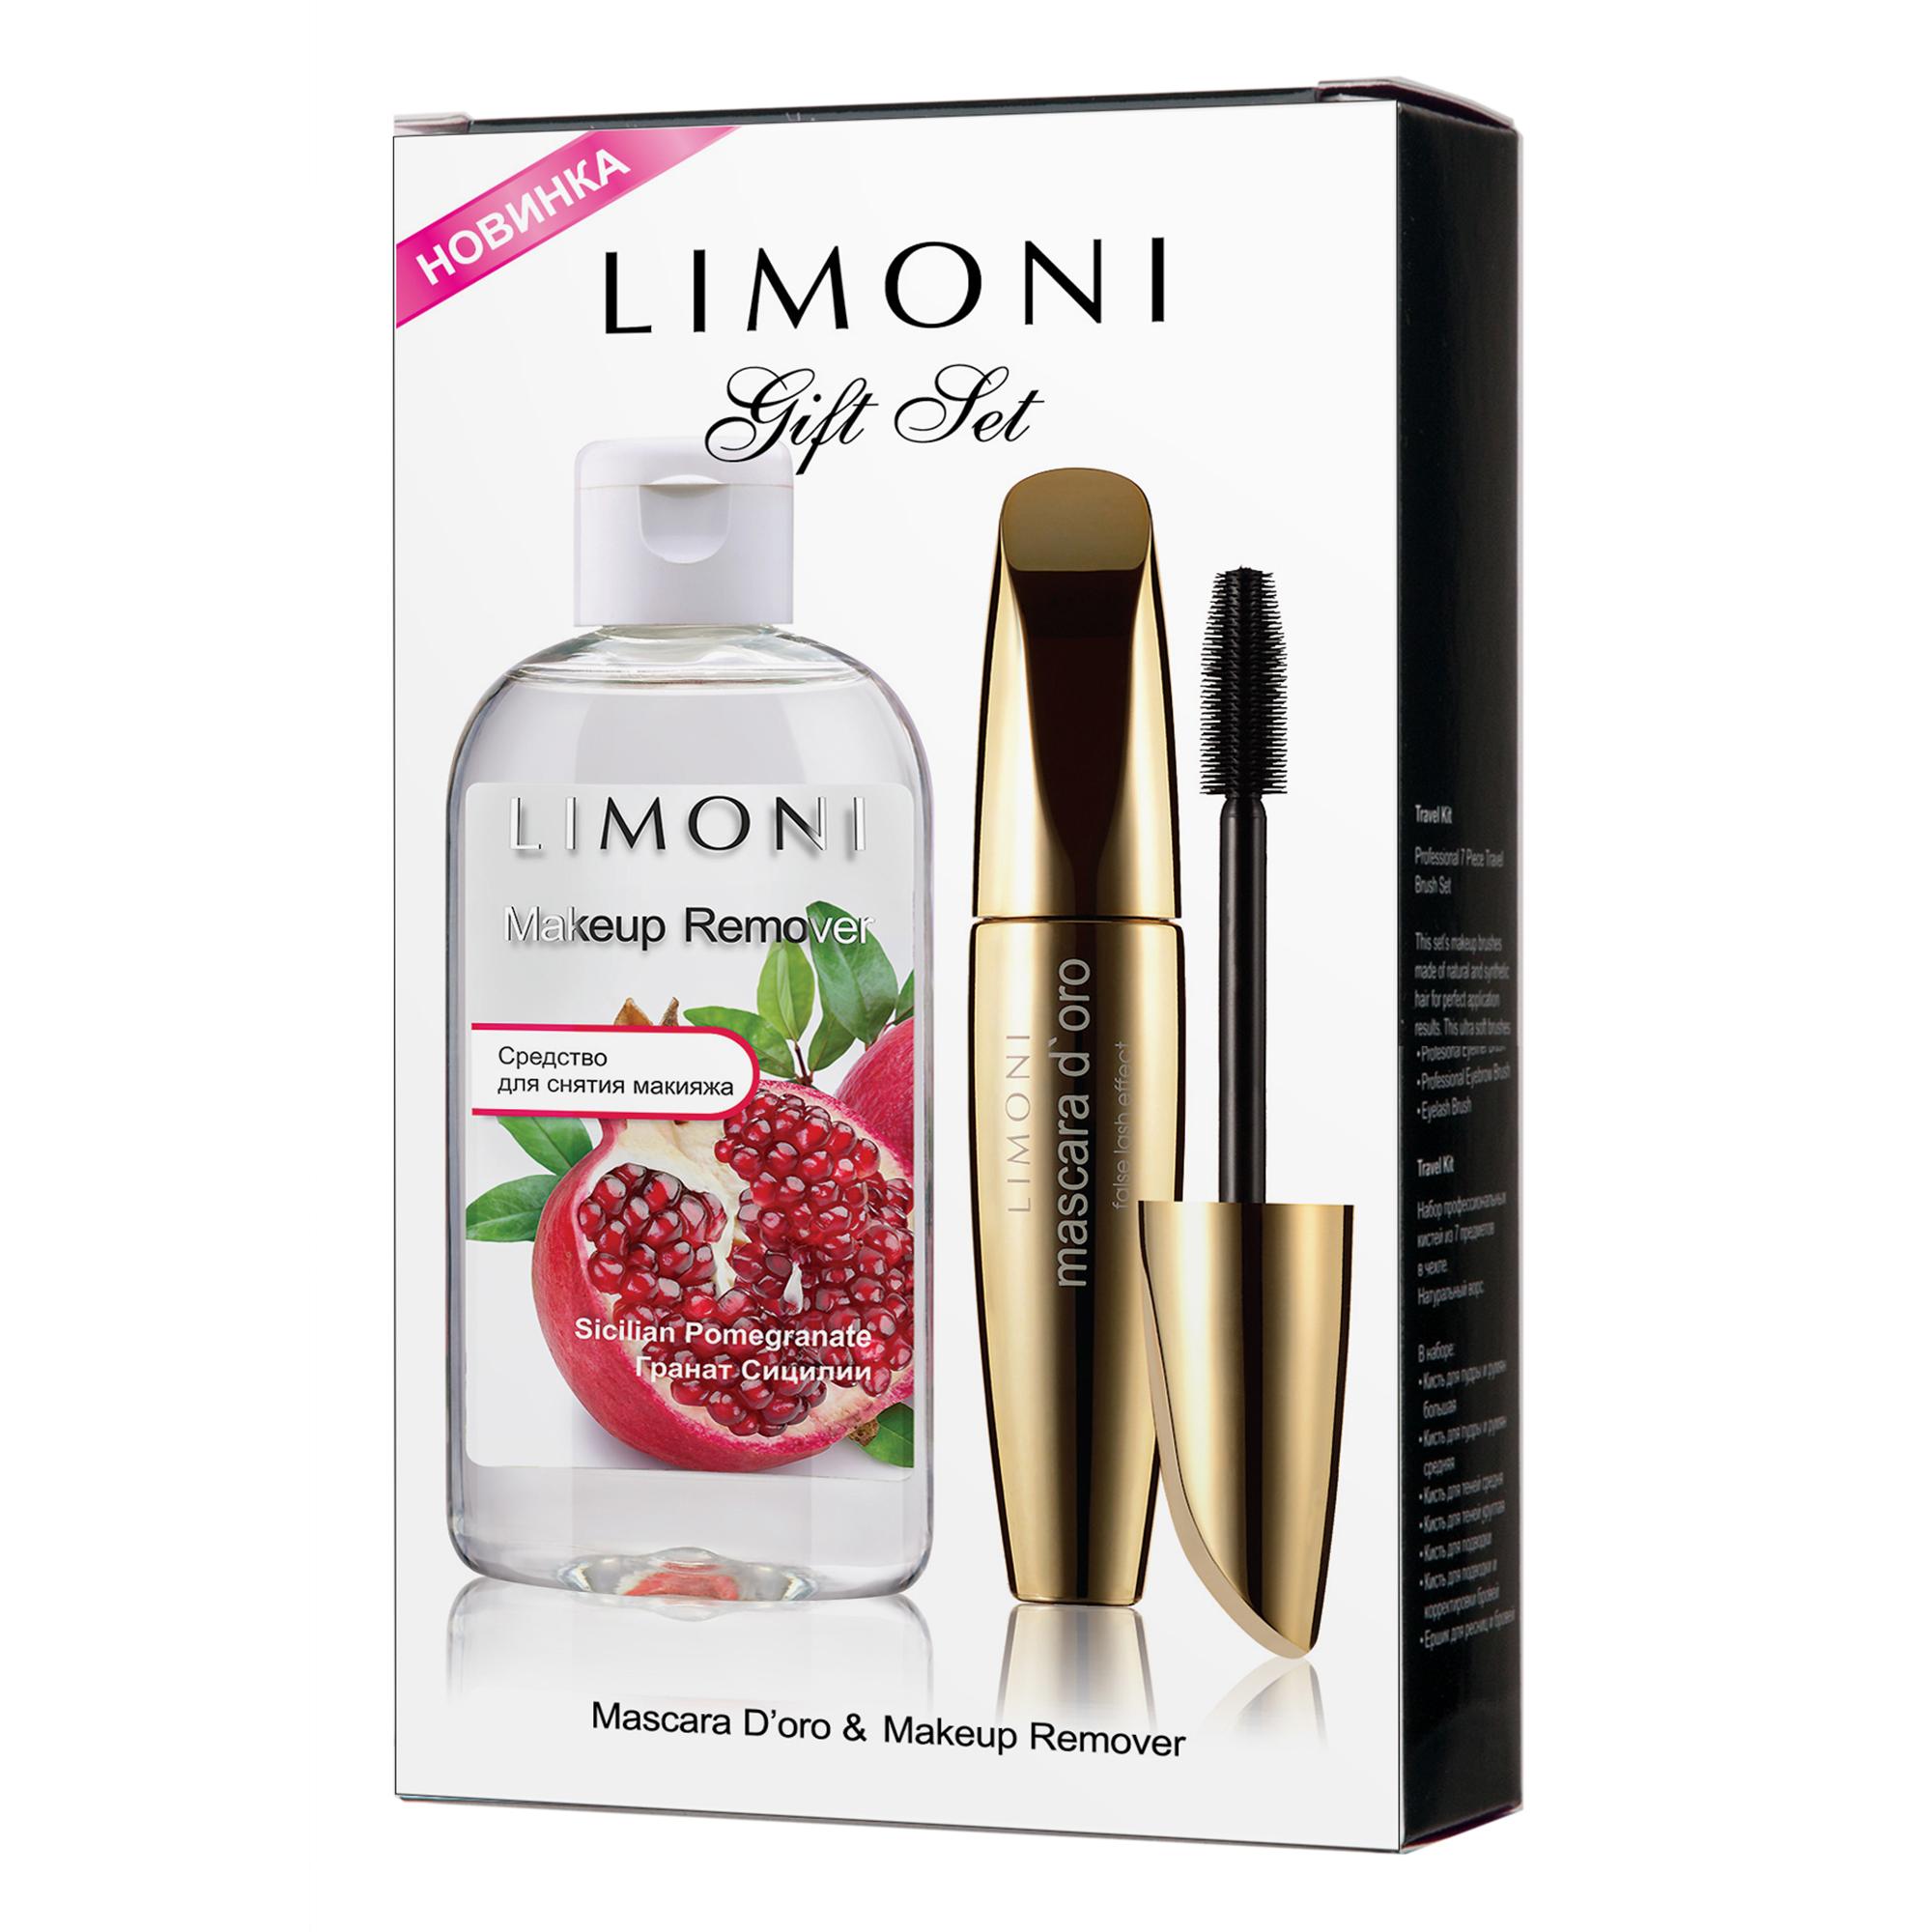 LIMONI Набор подарочный (тушь Mascara D'oro + средство для снятия макияжа Гранат Сицилии)